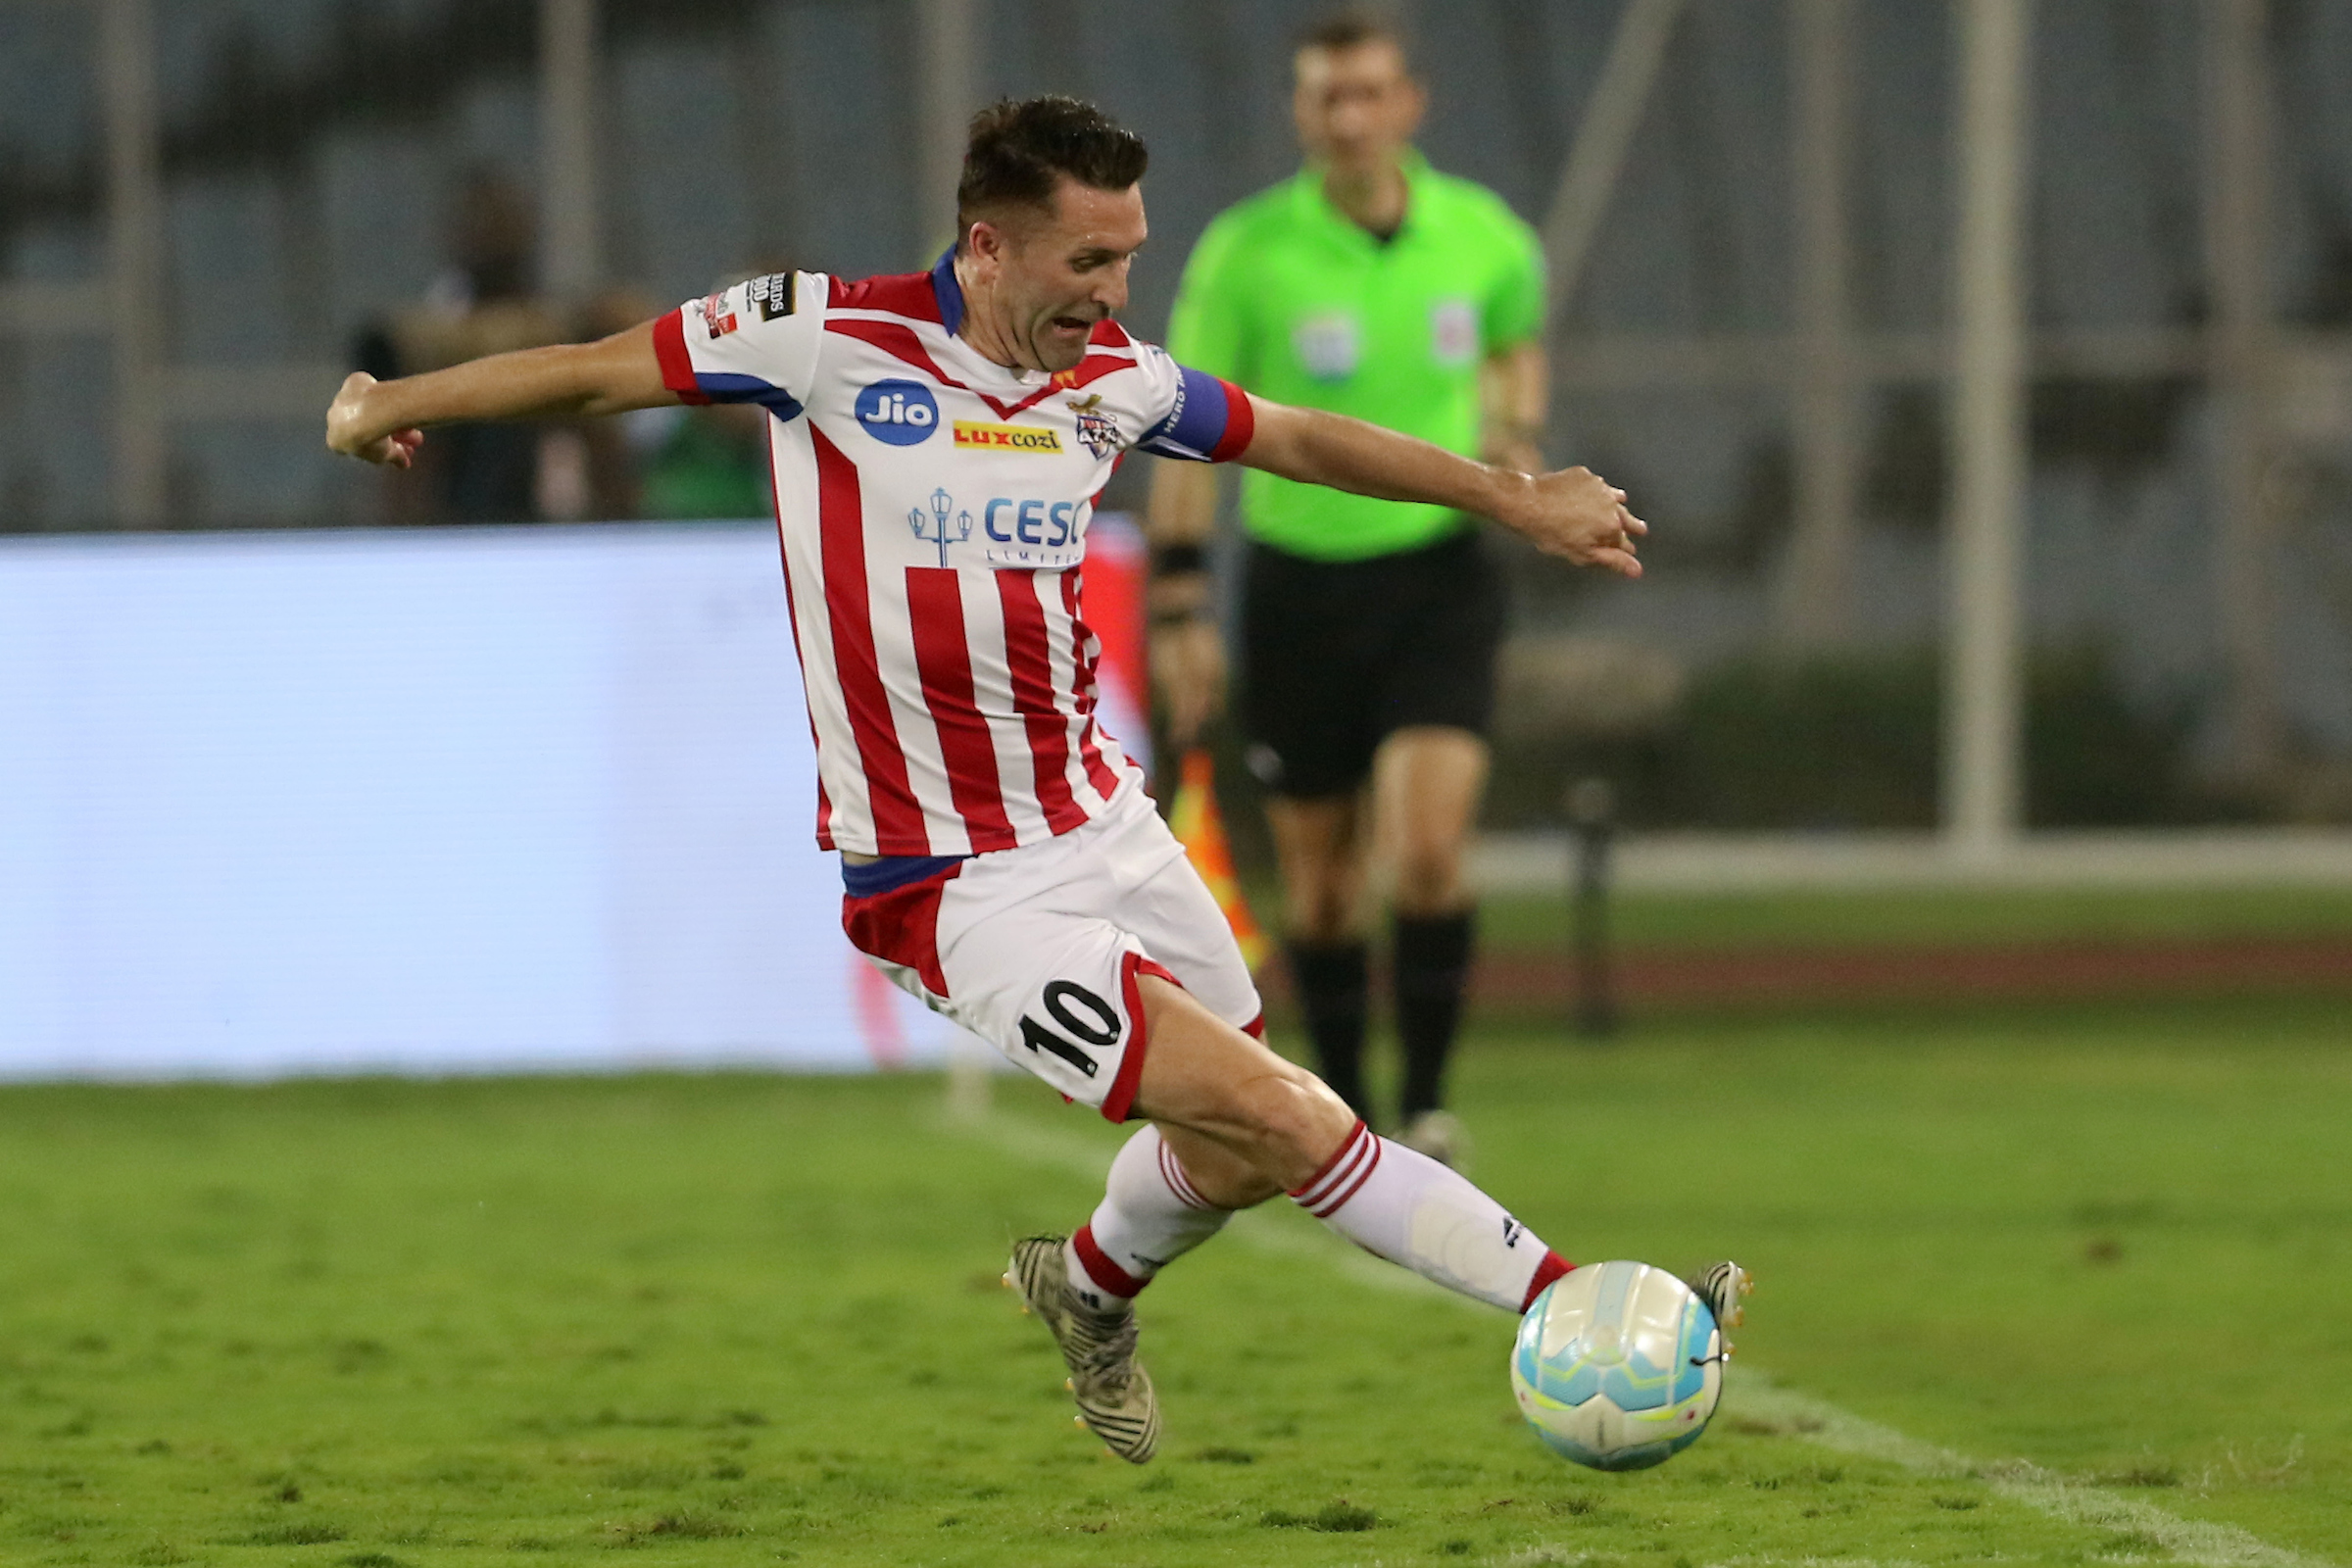 Robbie Keane ATK NorthEast United ISL 2017-18